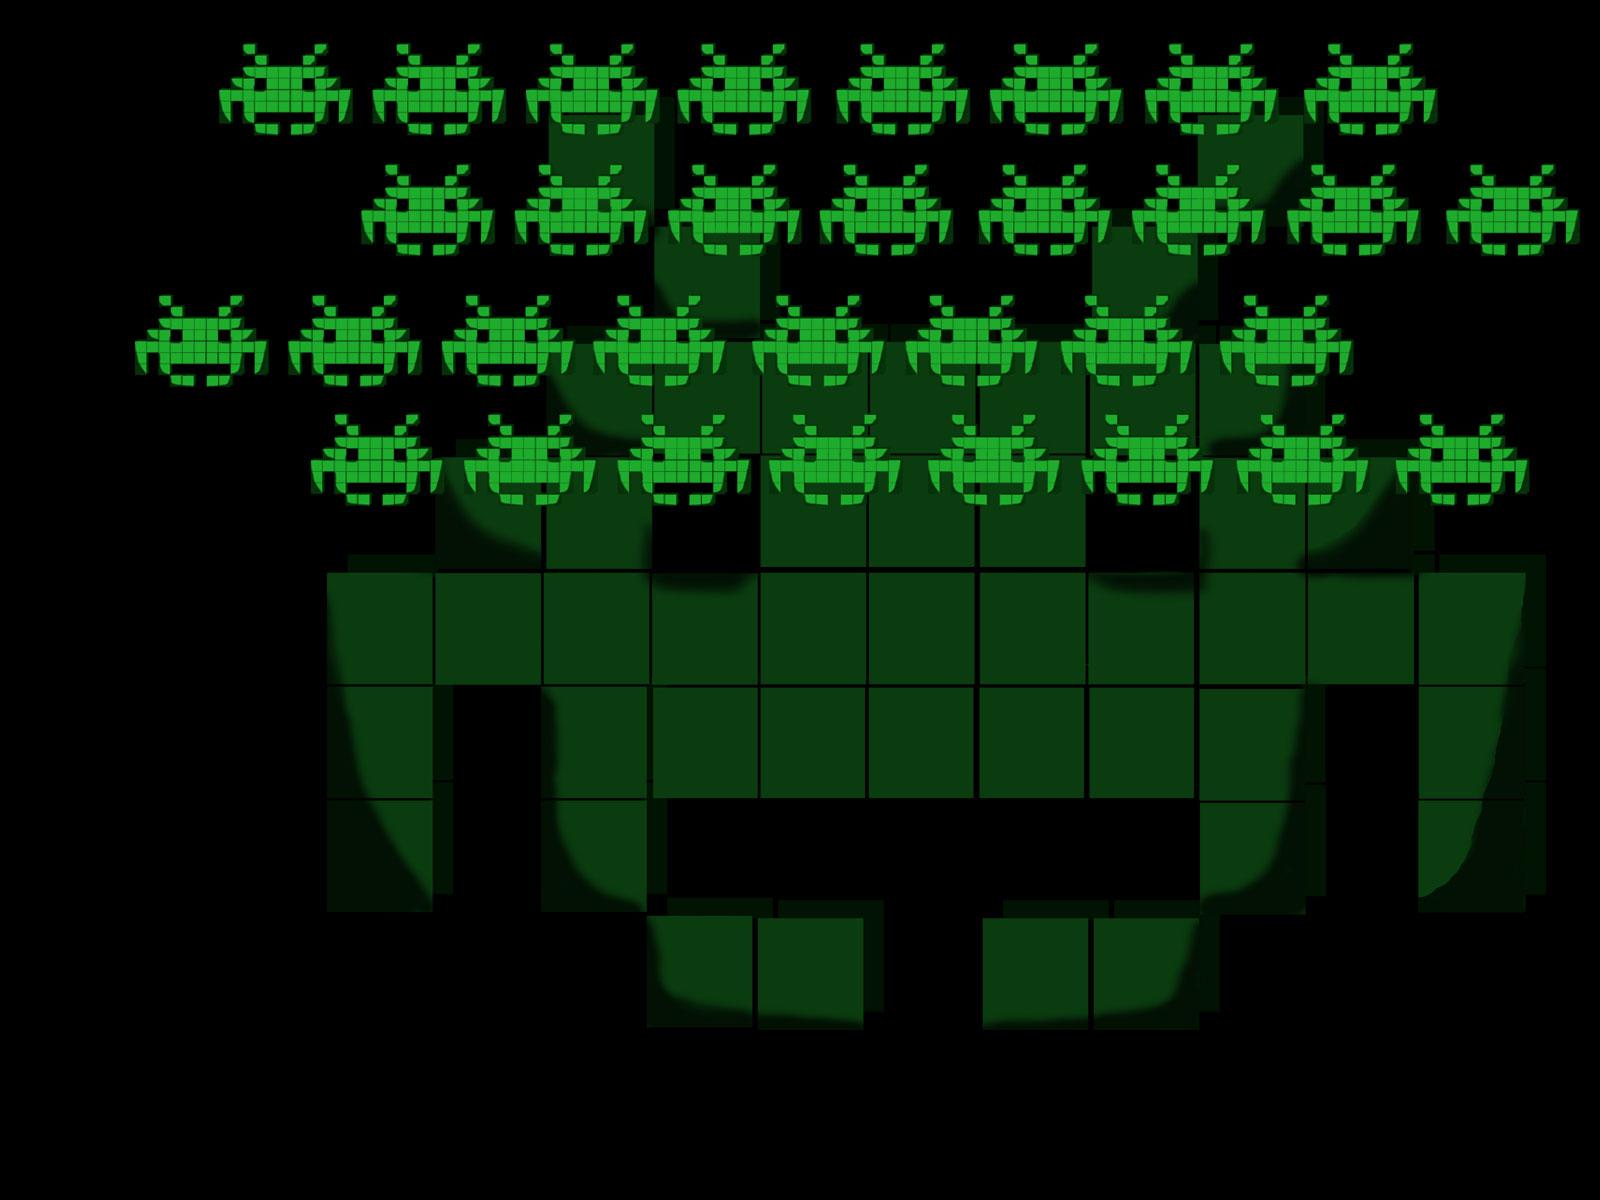 Space invaders wallpaper wallpapersafari for Space invaders